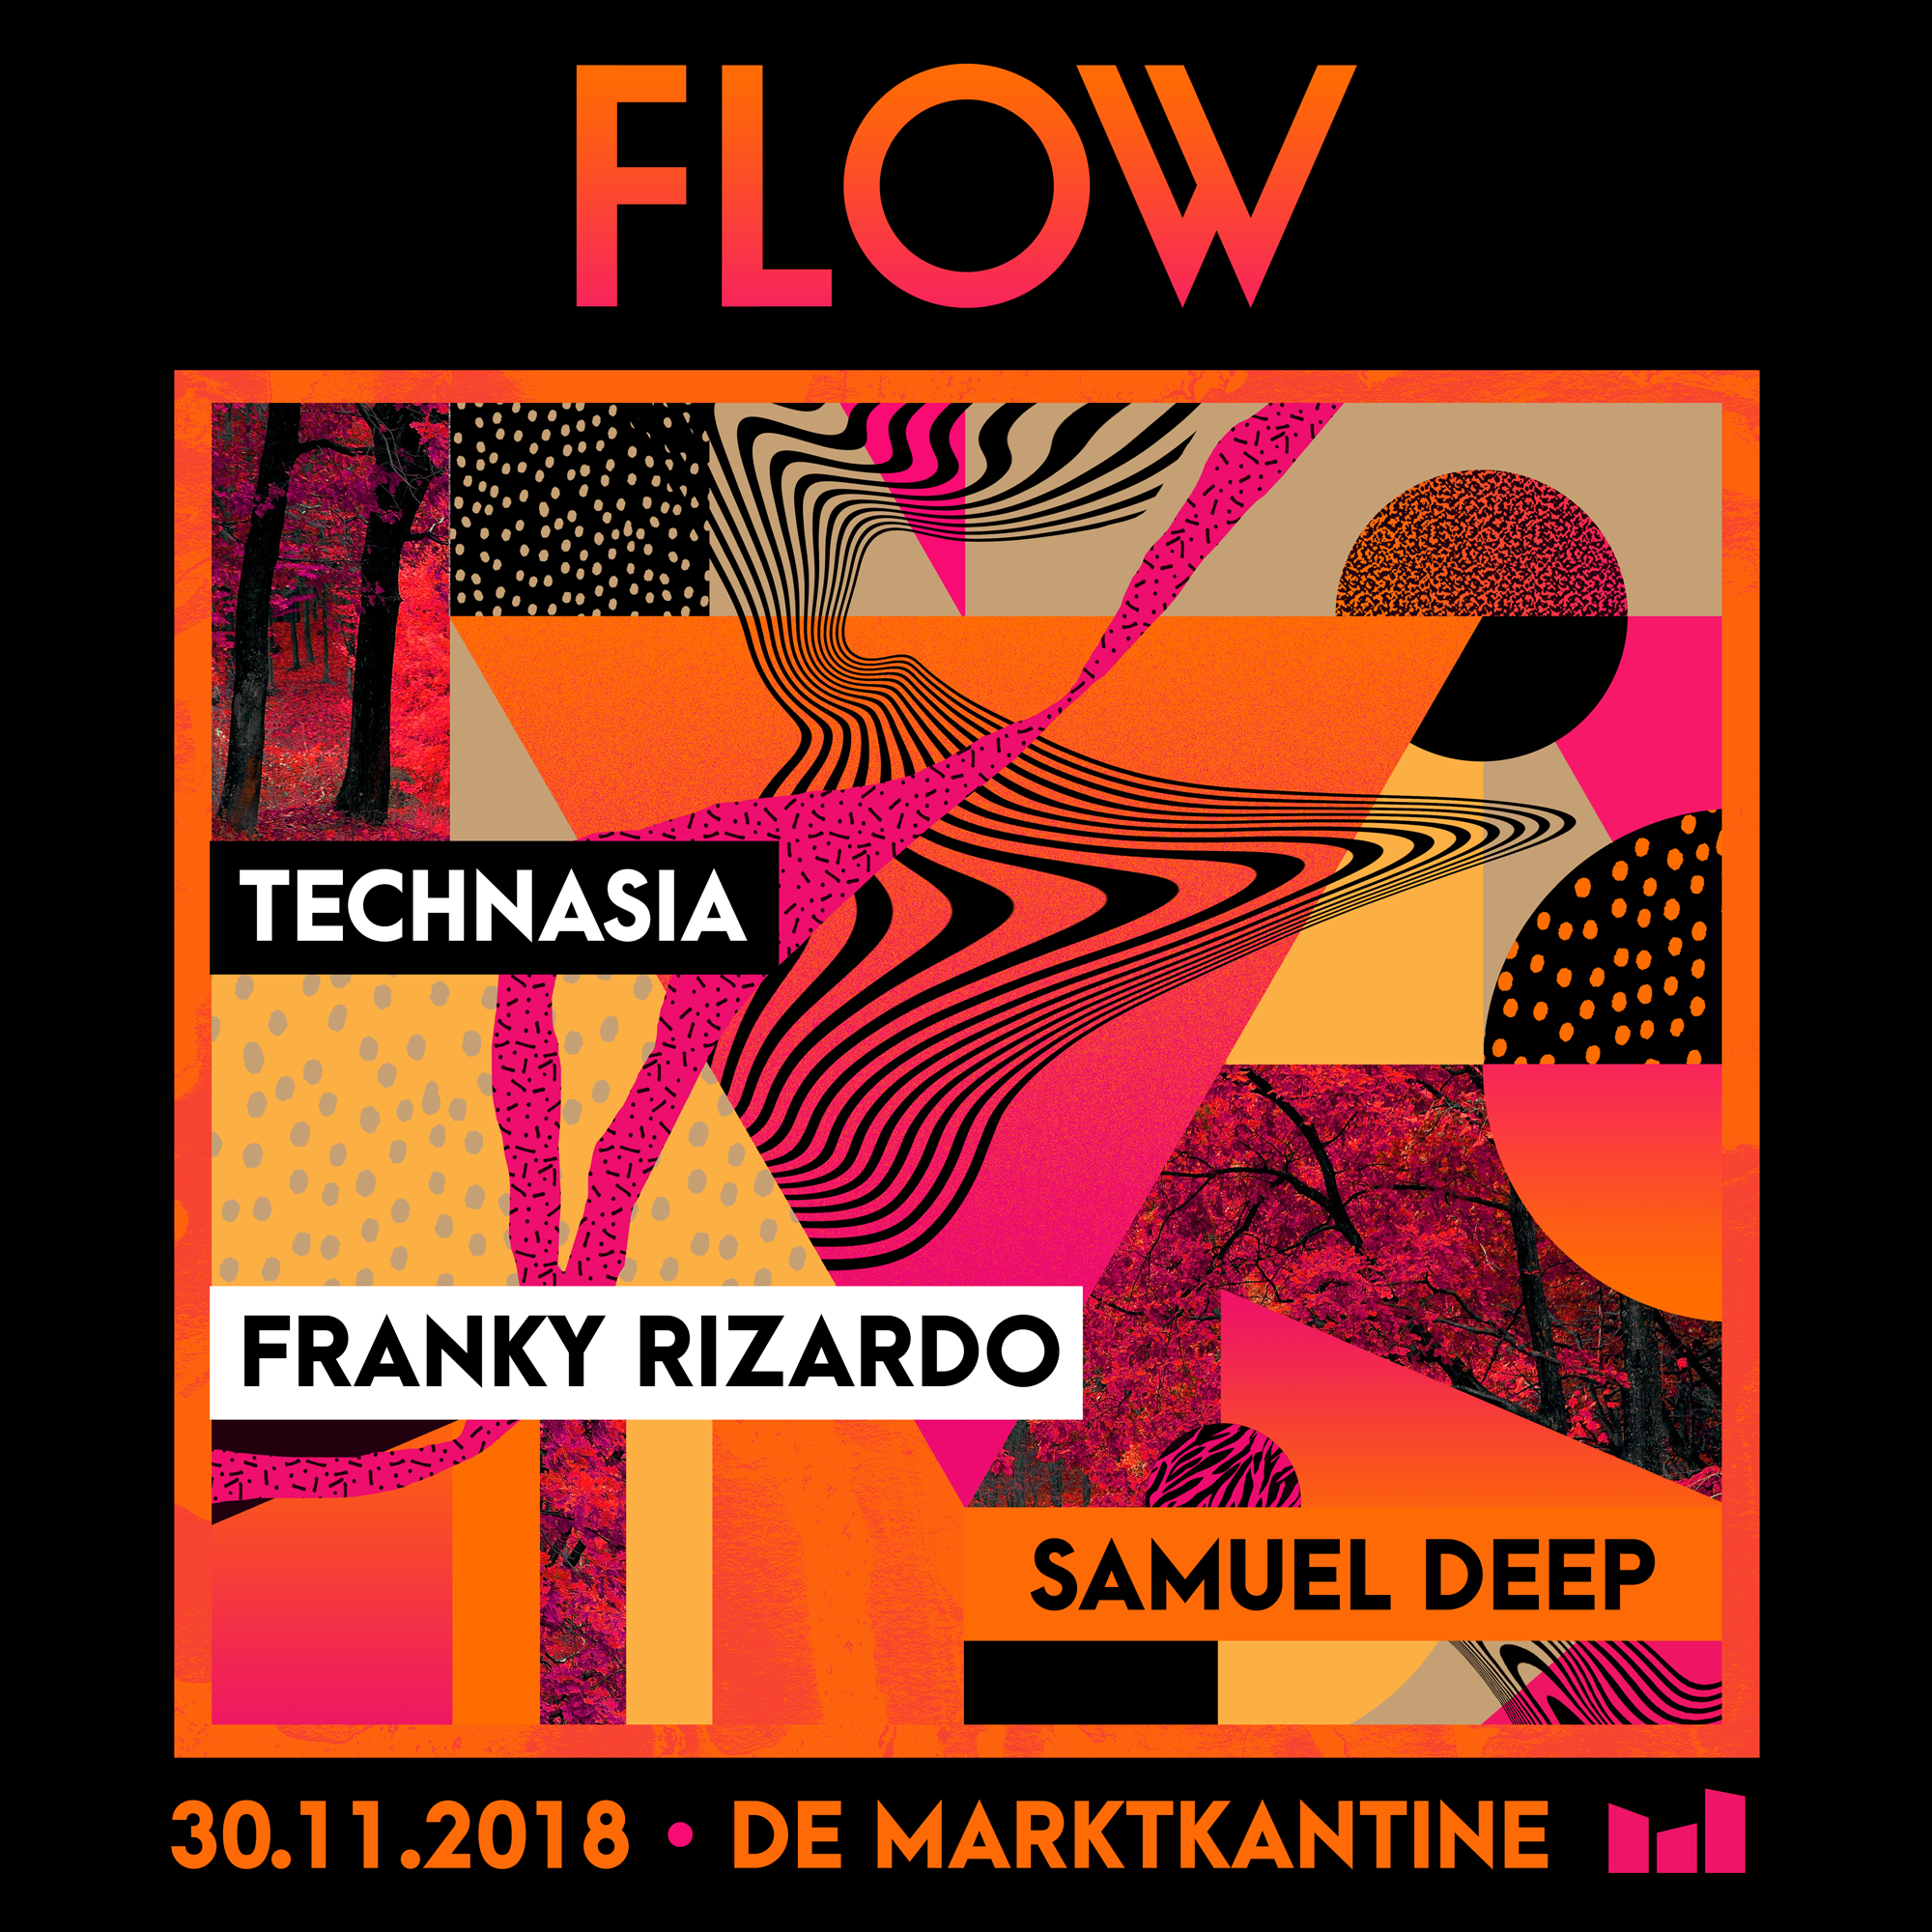 flow_2_MK_square.png